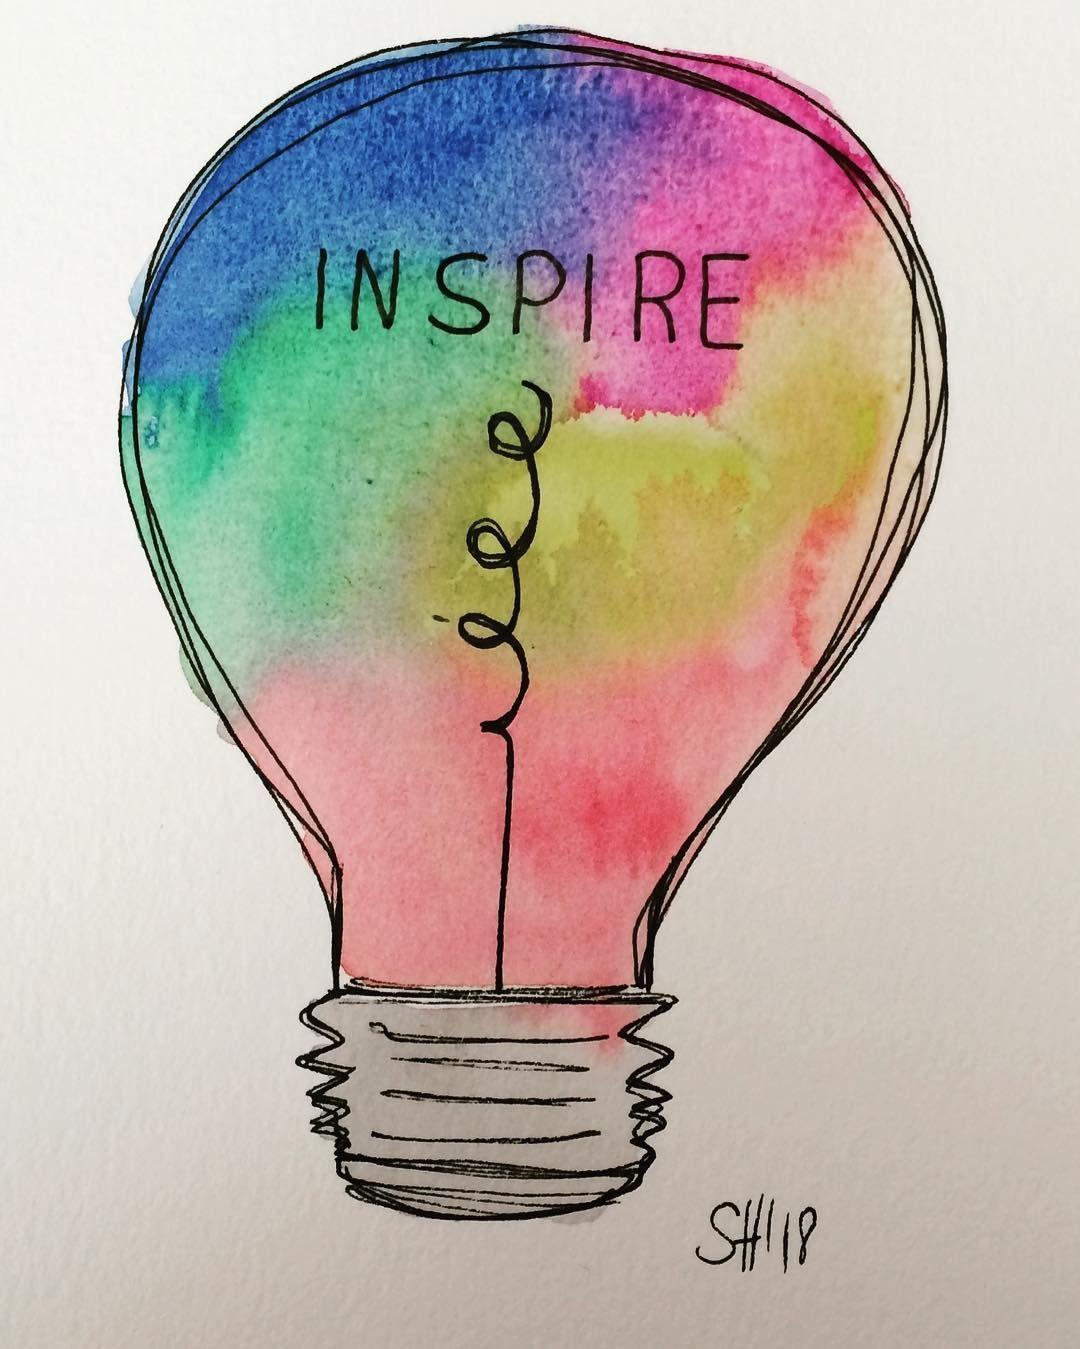 Light Lightbulb Inspiration Inspire Aquarell Handmade Handlettering Handgemalt Gluhbirne Inspiration Inspi Aquarell Selber Malen Gluhbirne Zeichnung